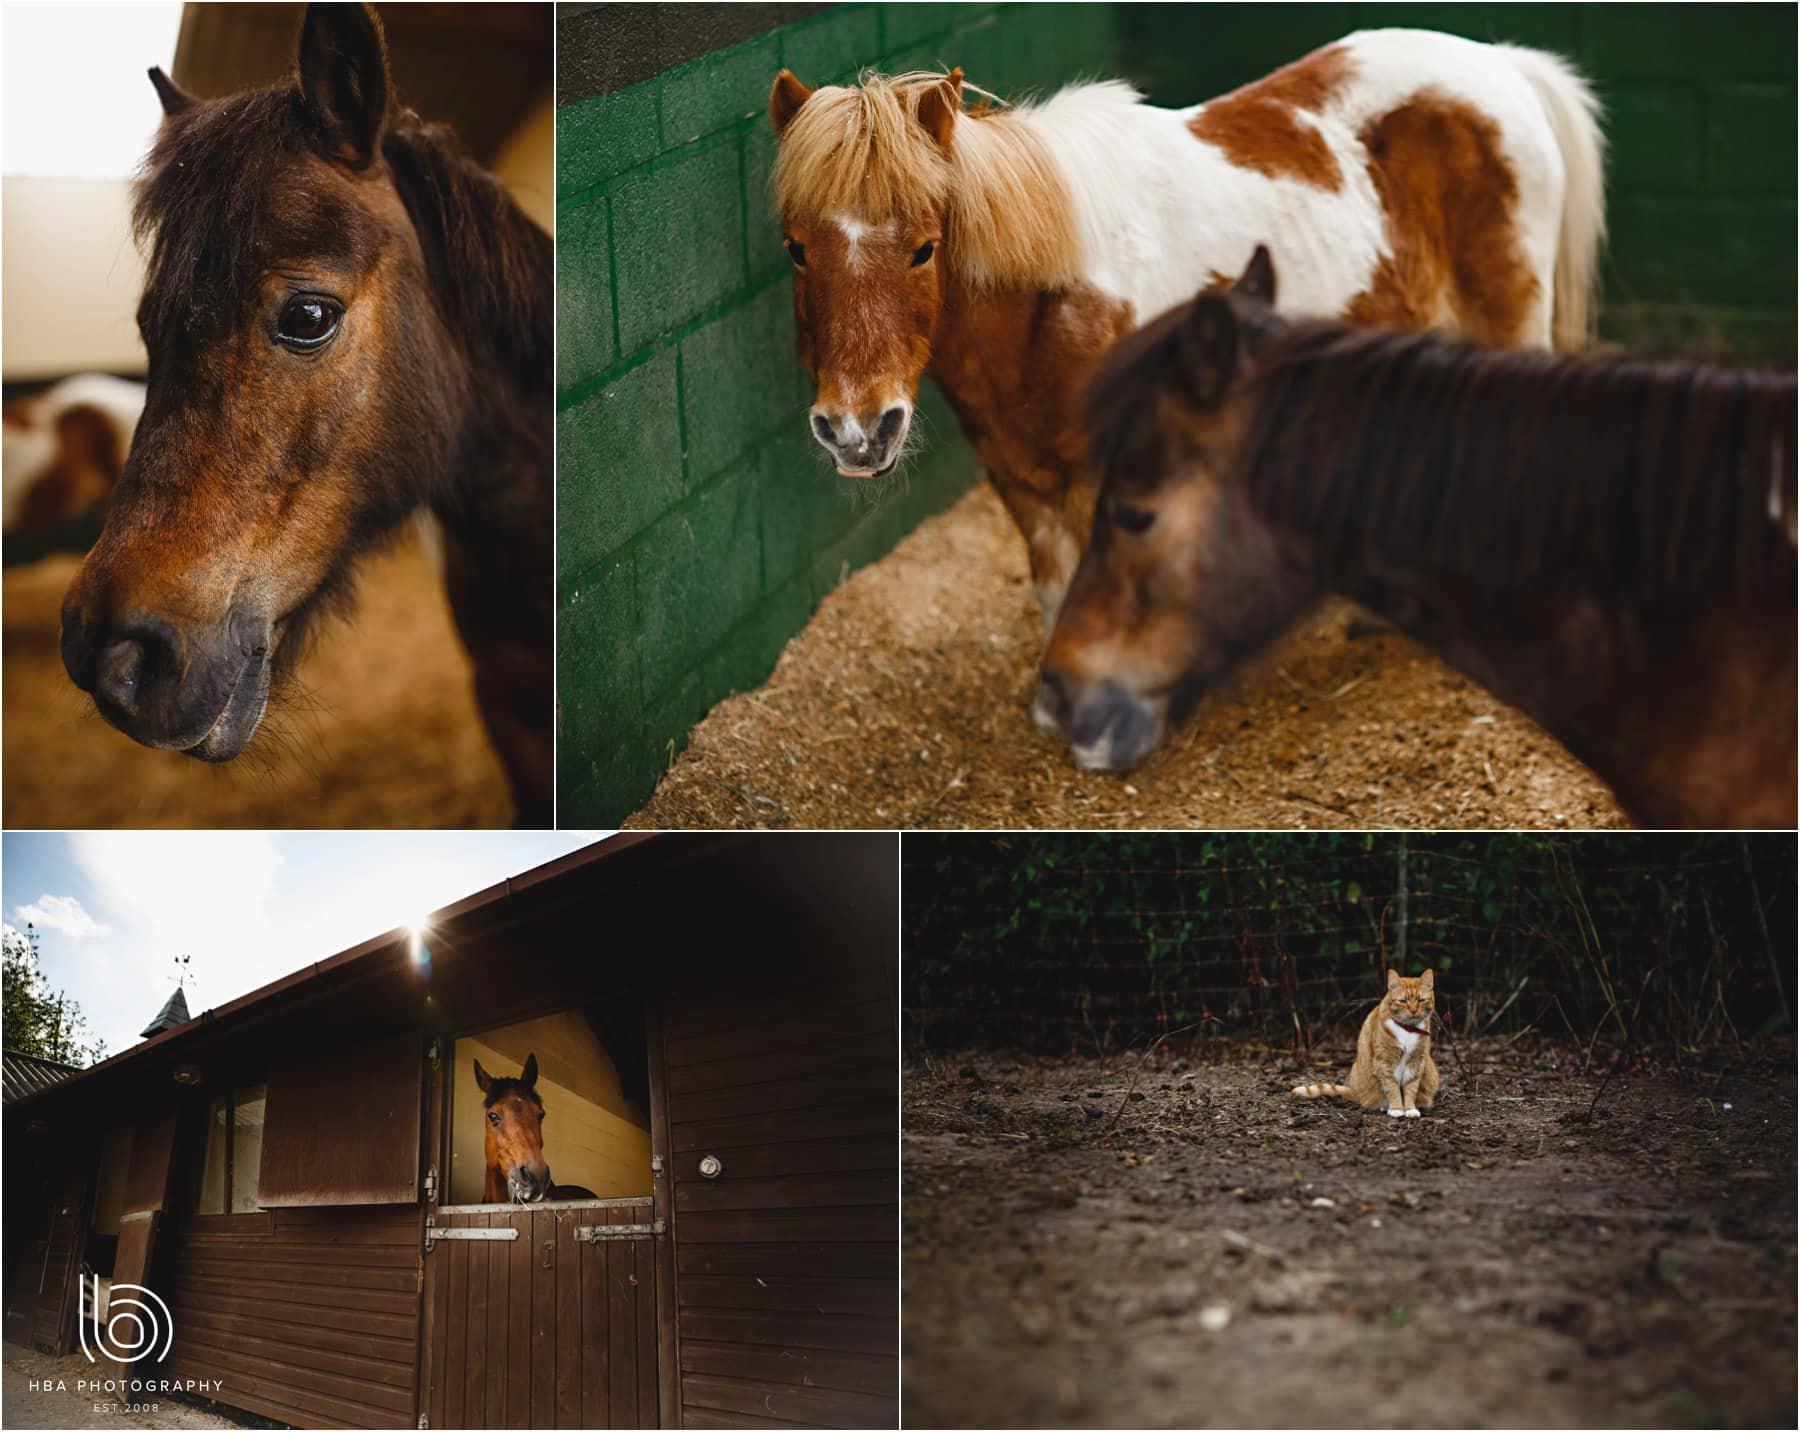 the bride's horses